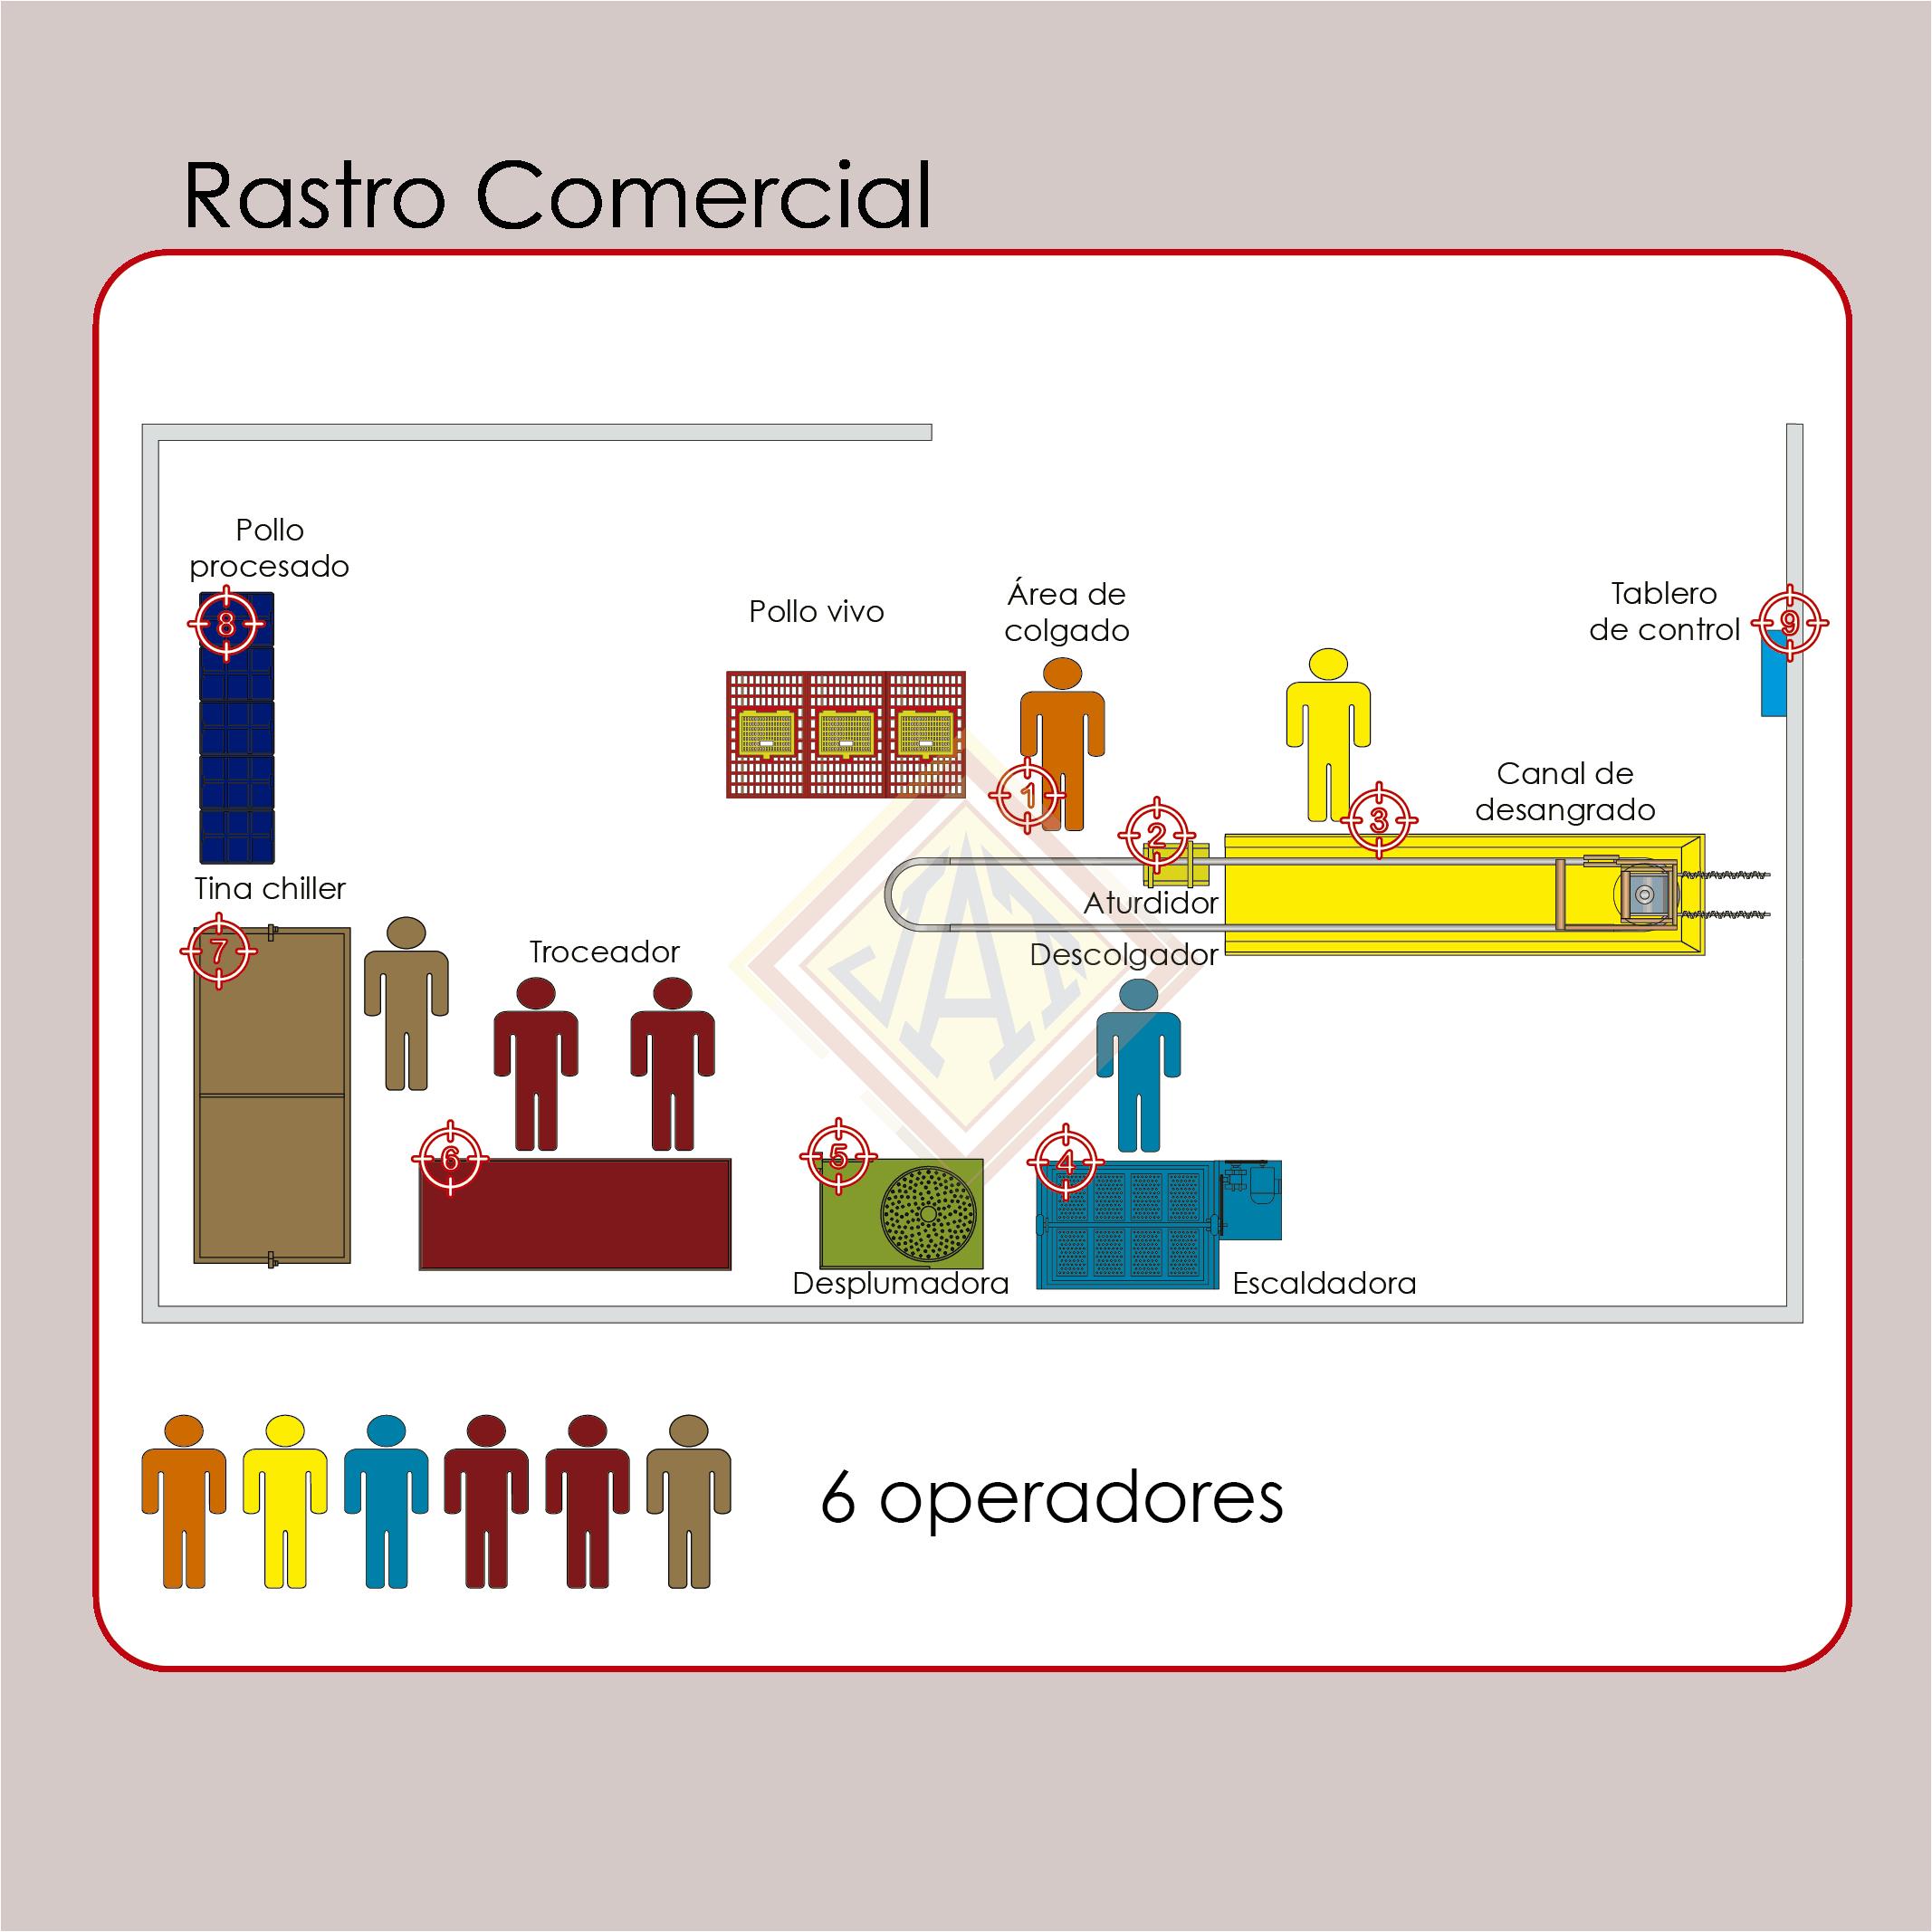 Rastros1 512x512